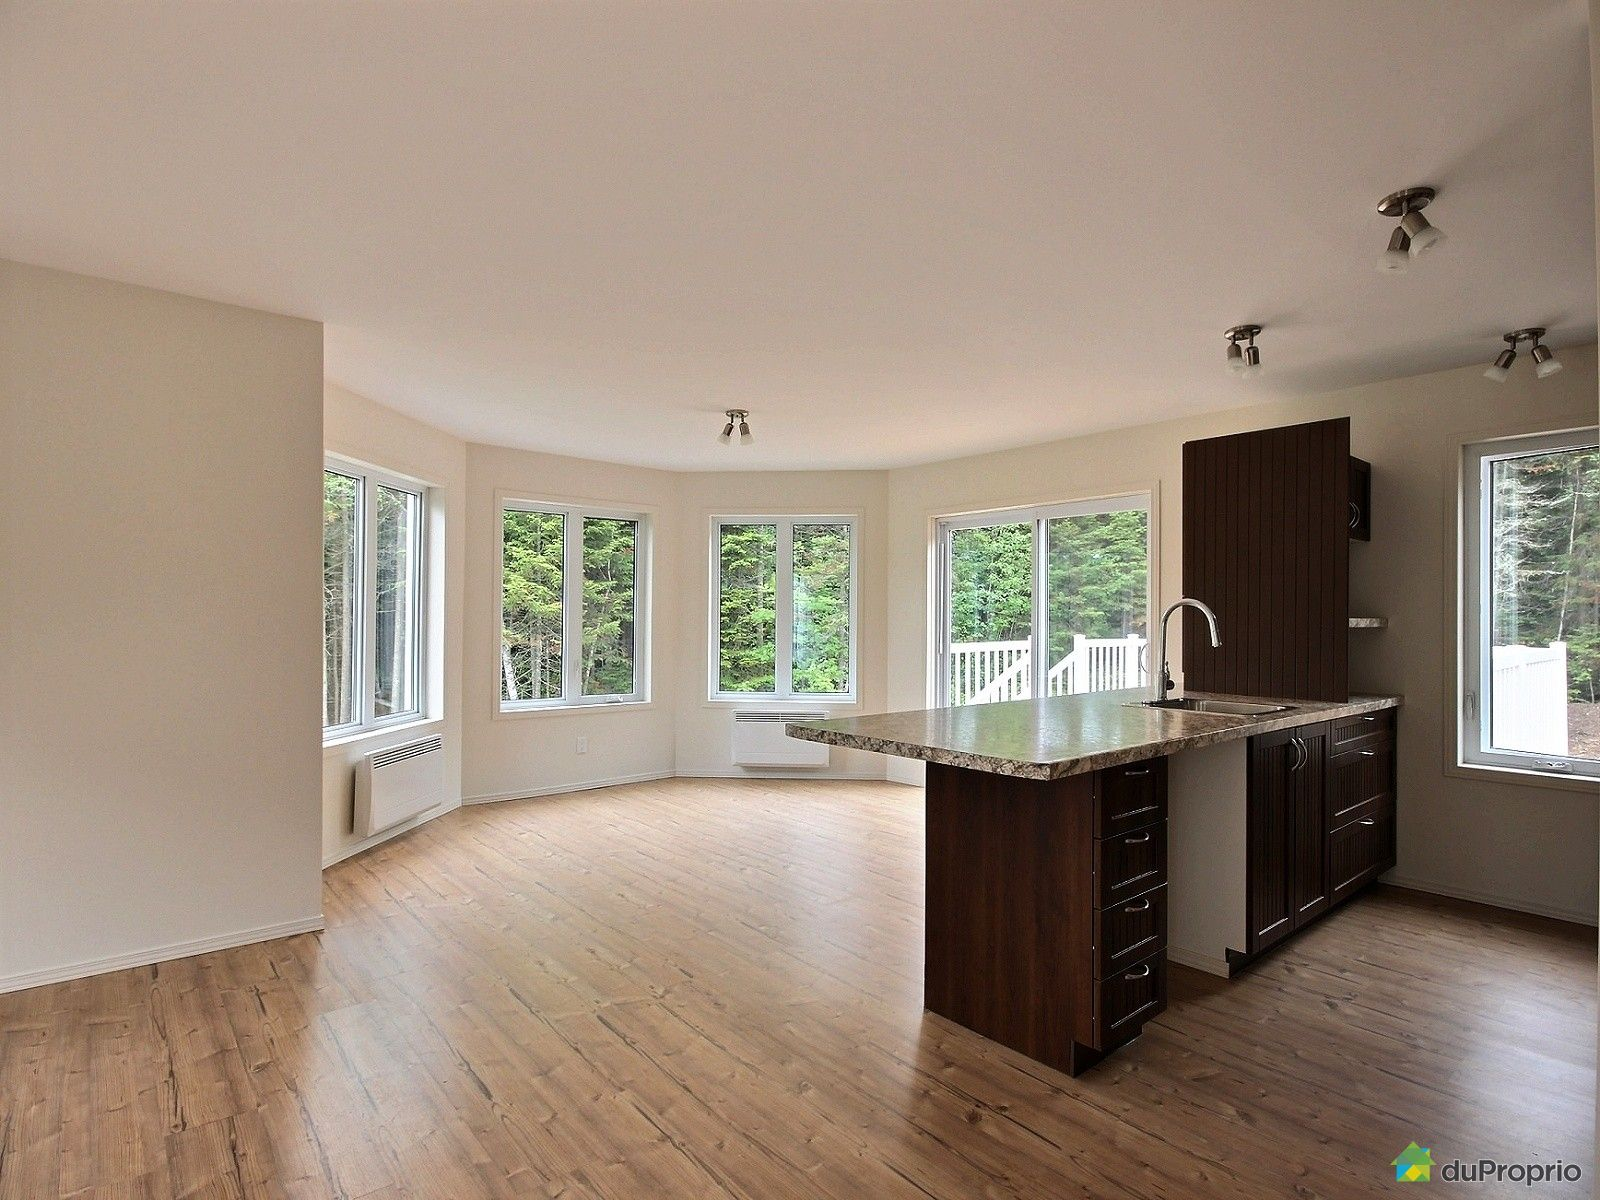 maison neuve vendu lac k nogami immobilier qu bec. Black Bedroom Furniture Sets. Home Design Ideas